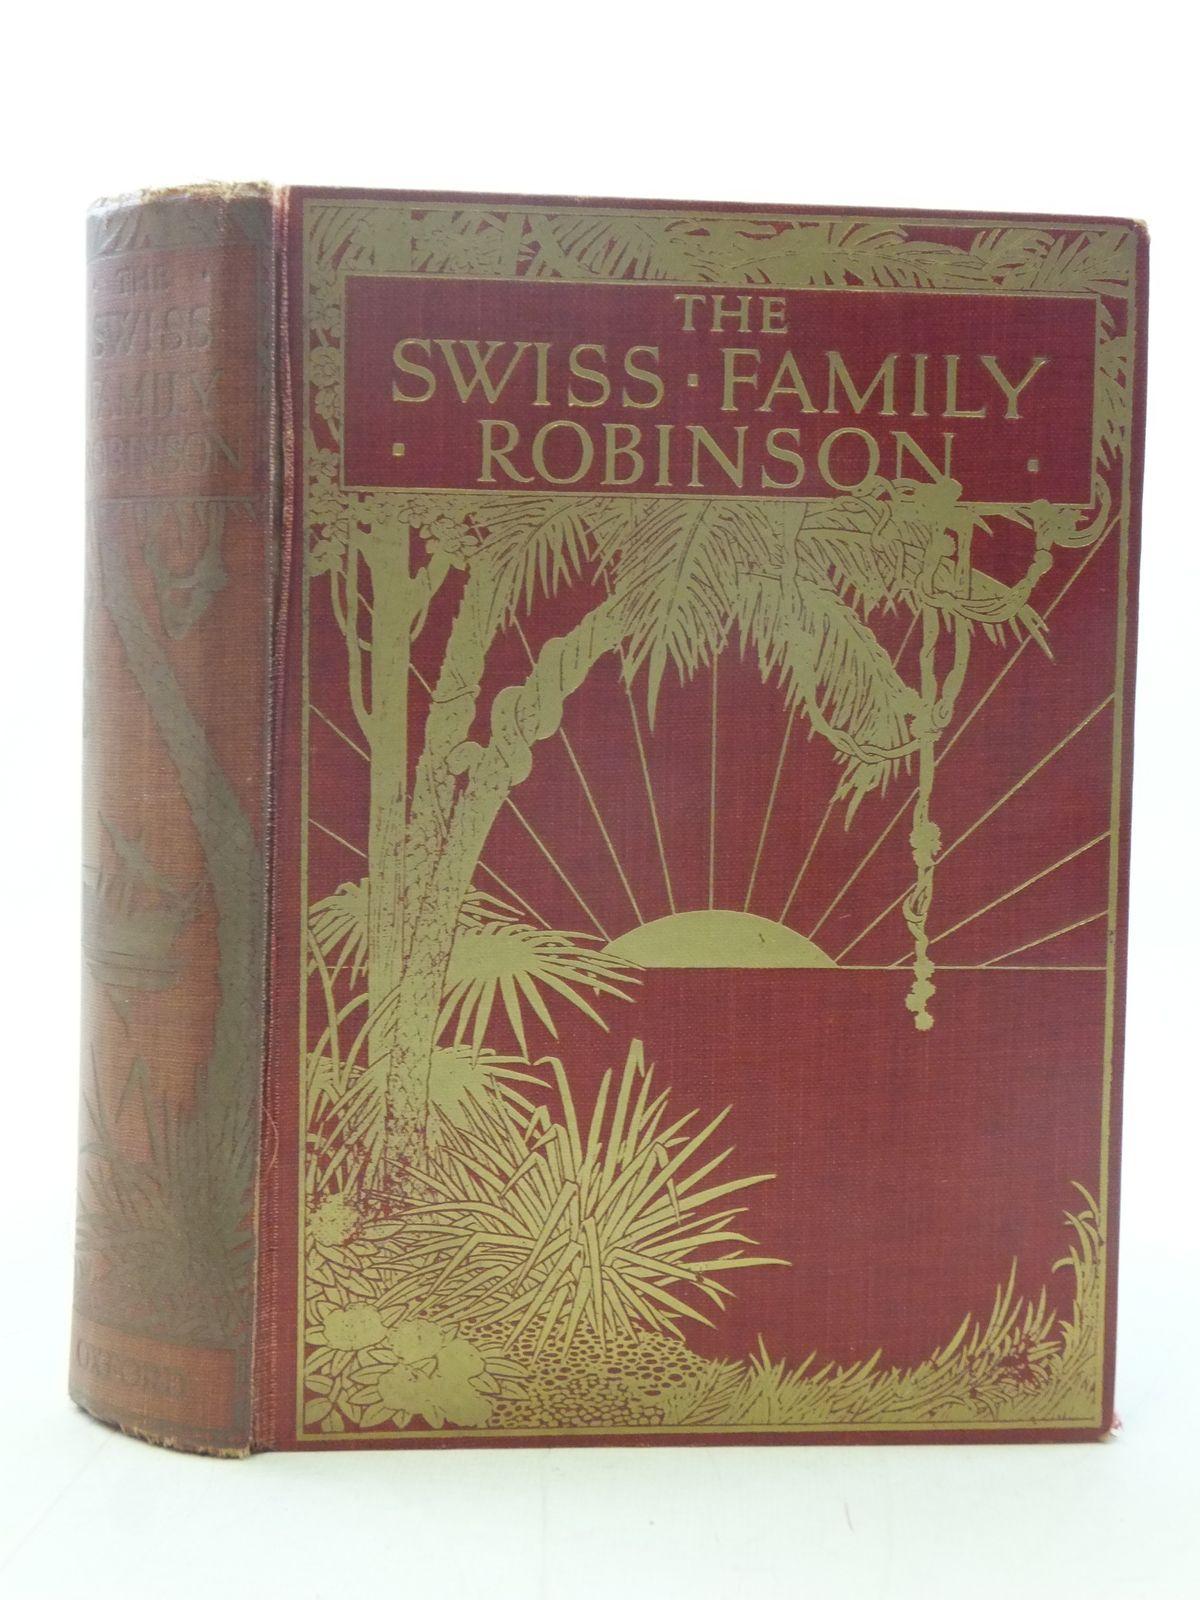 The Swiss Family Robinson Written By Wyss Johann Rudolph